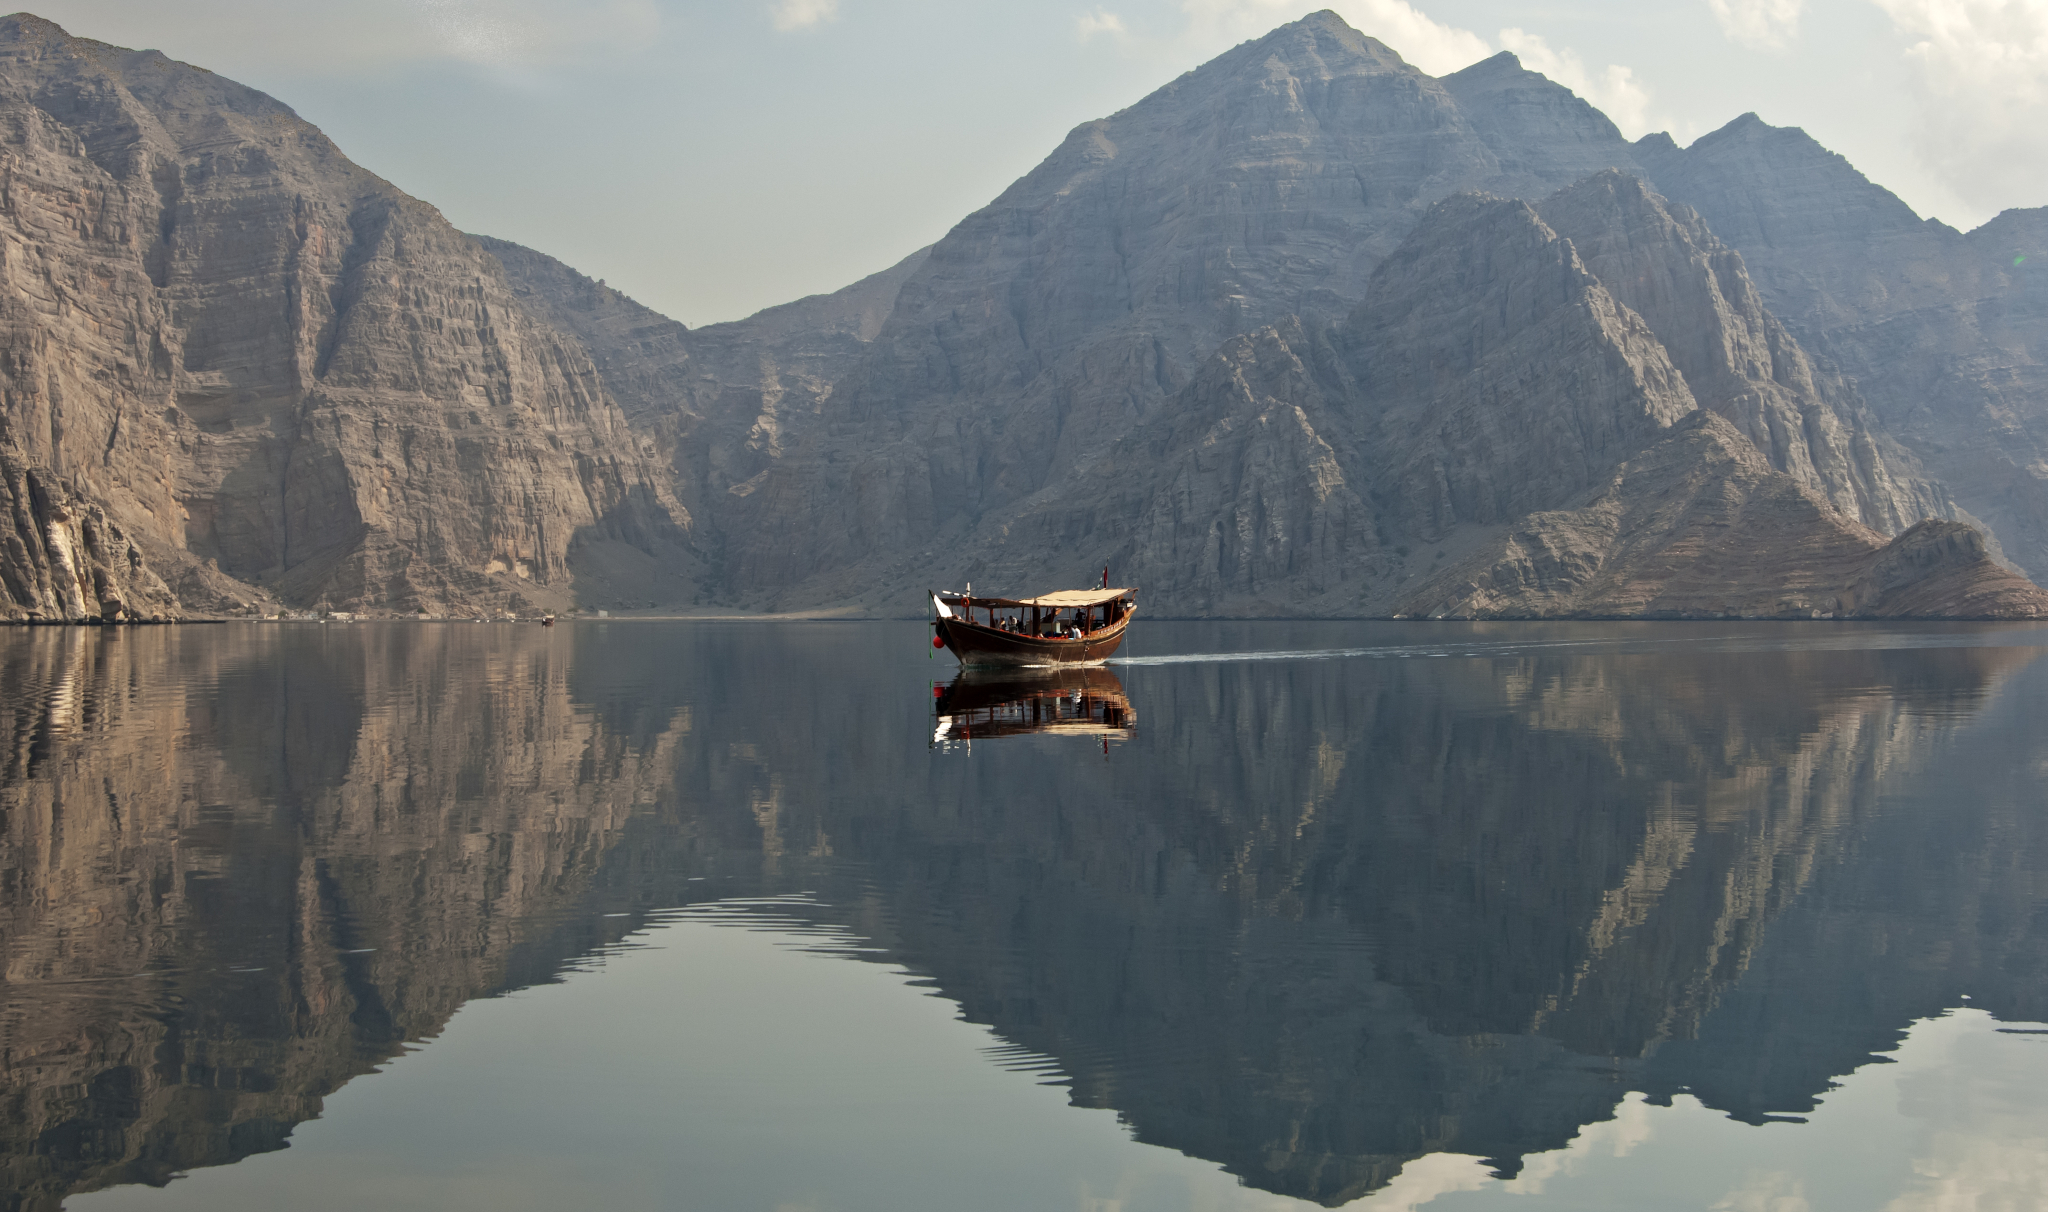 A dhow passes the Musandam peninsula (Photo: Gunter Fischer / Getty)